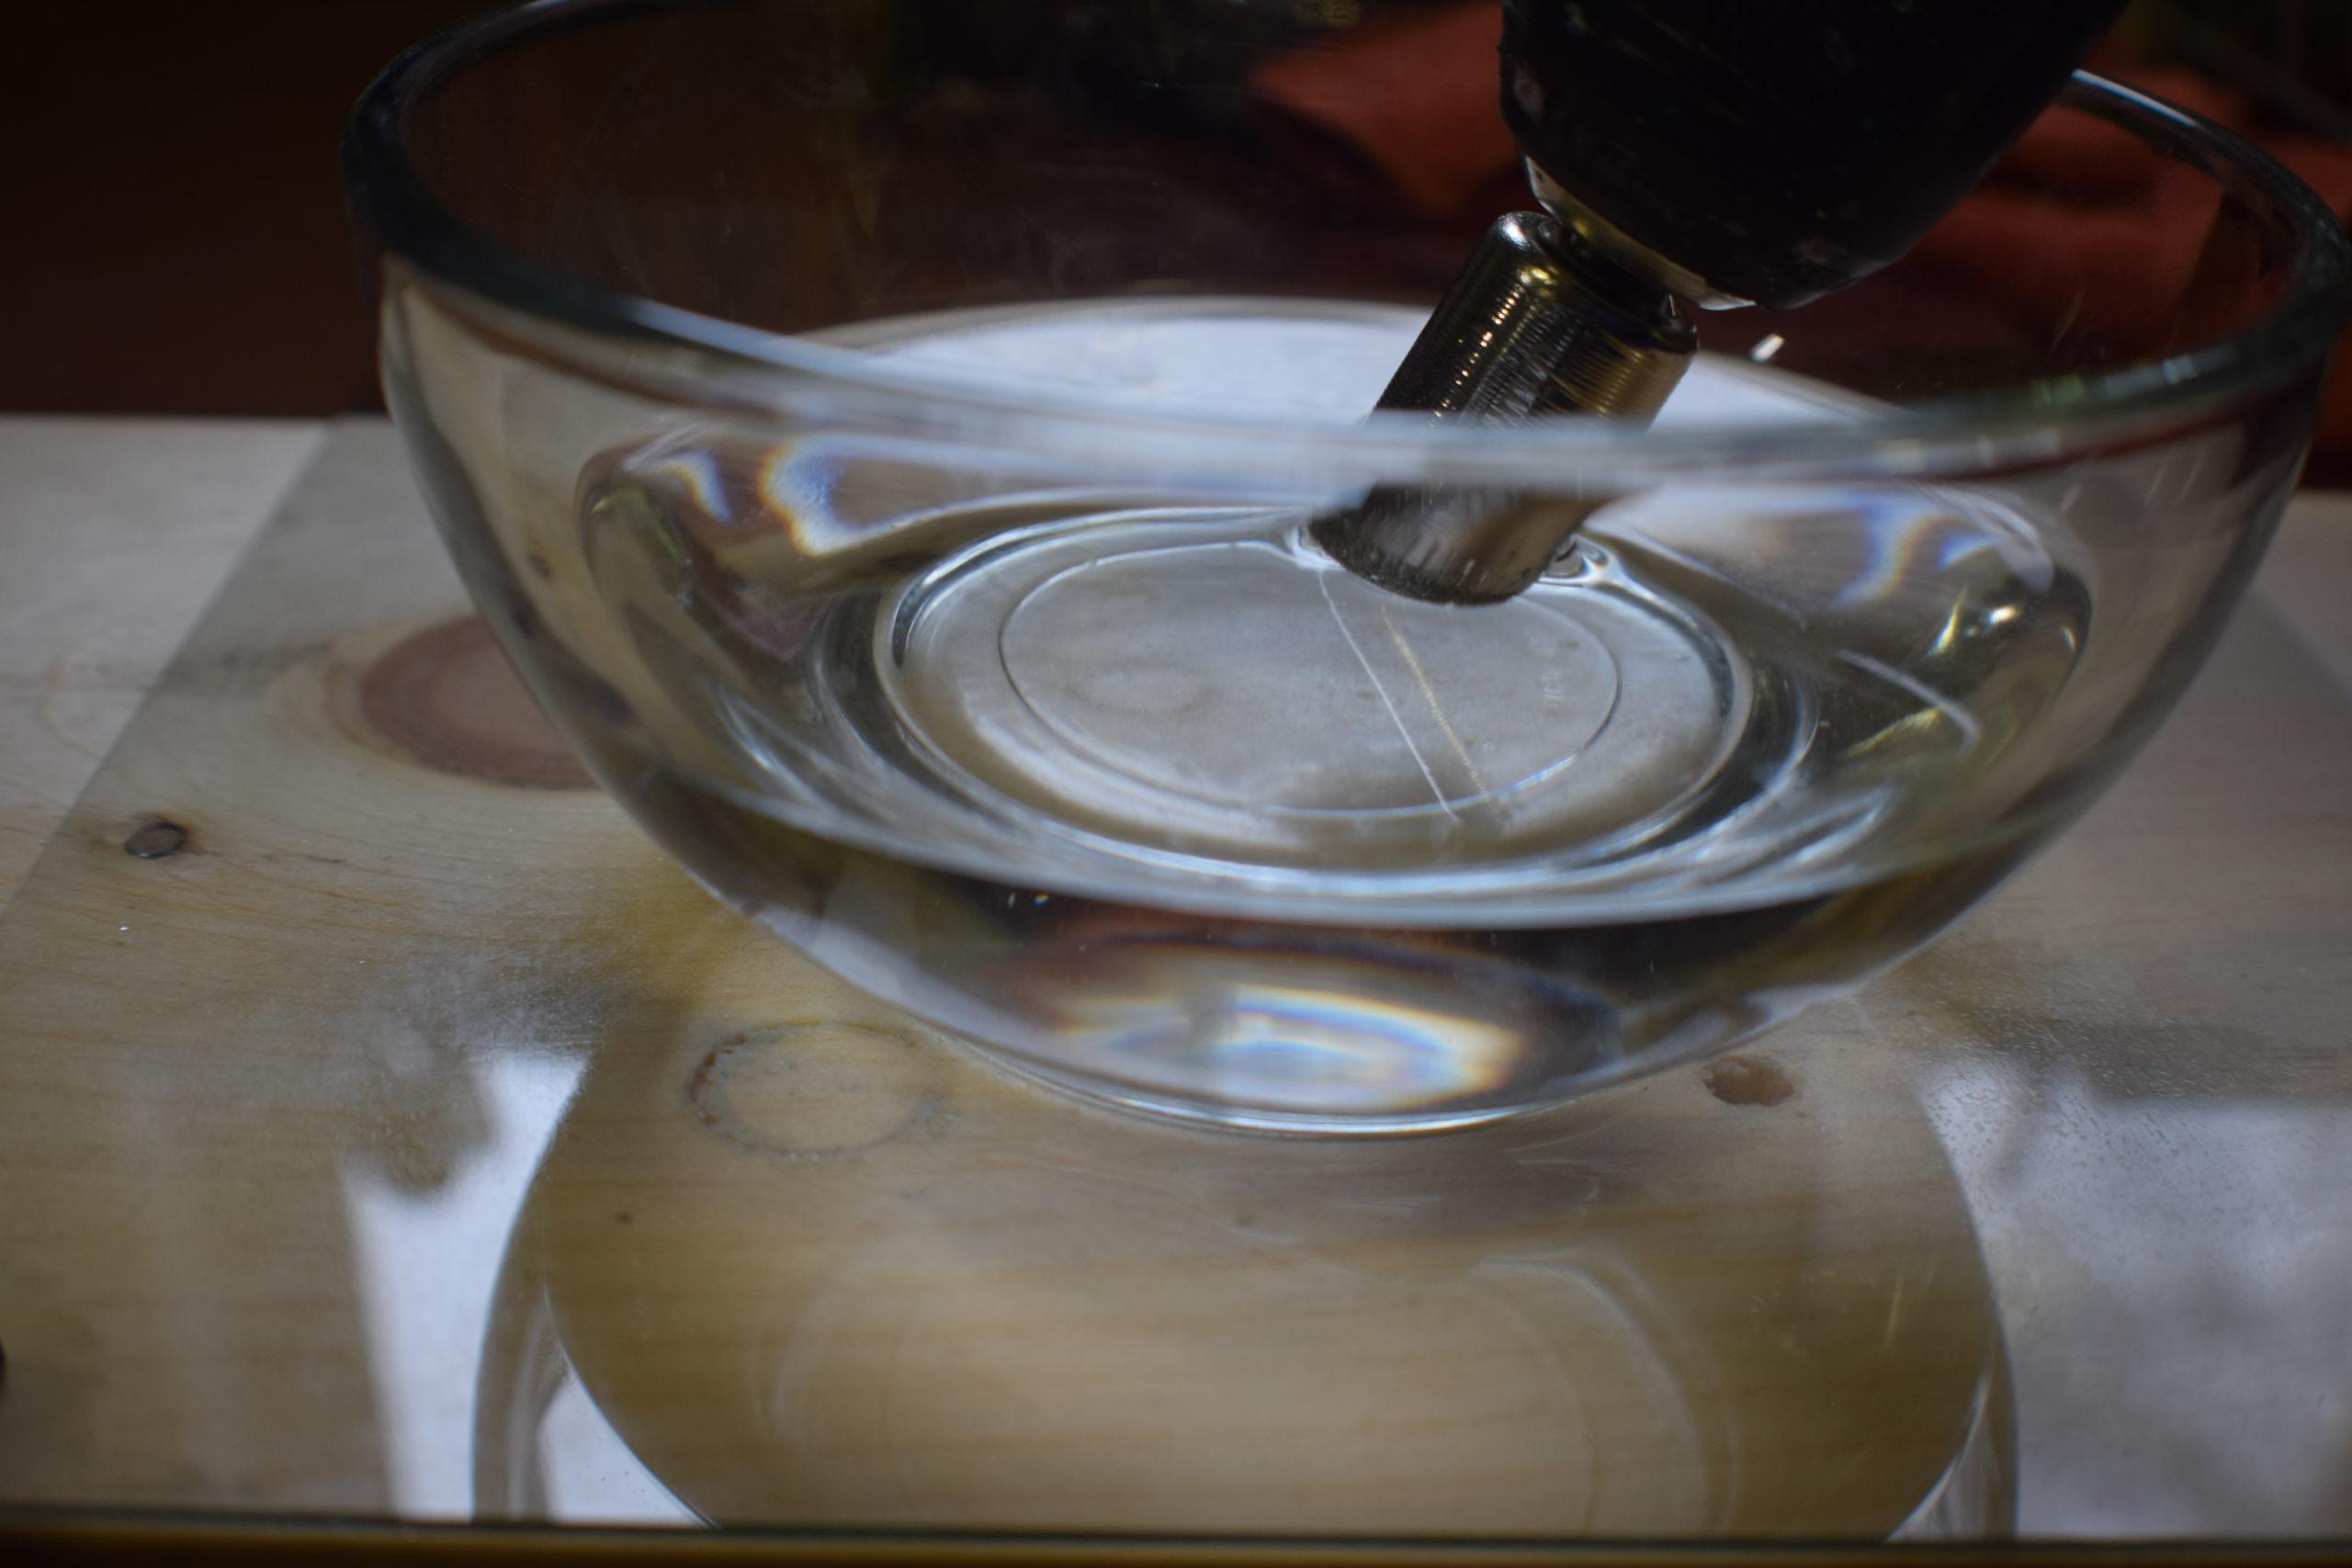 rinsing diamond drill bit in a dish of water